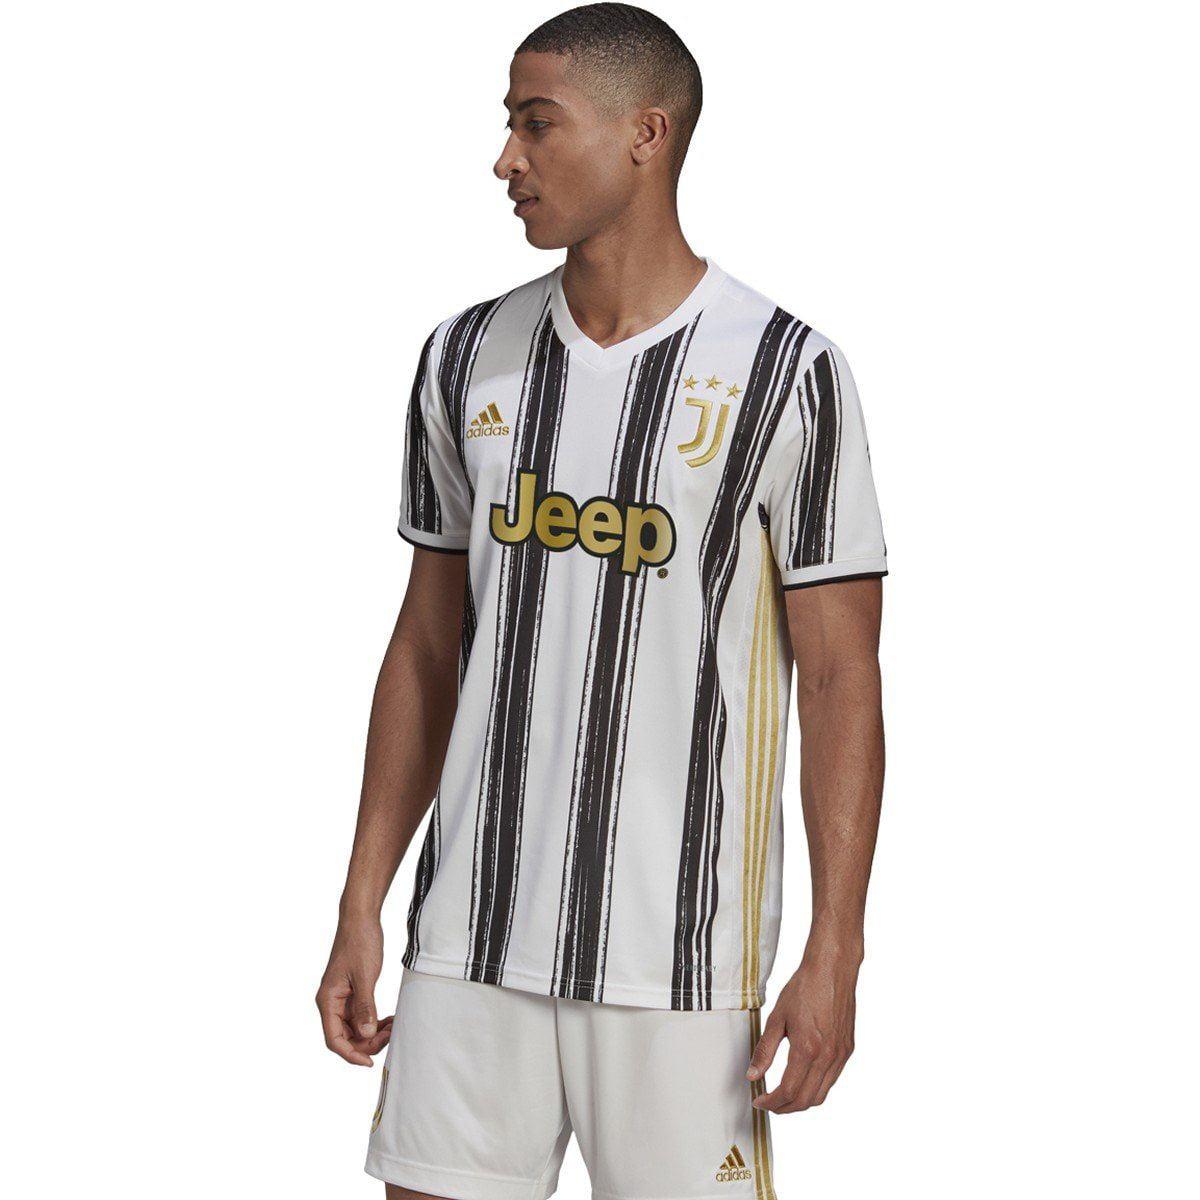 adidas Men's Soccer Juventus 20/21 Home Jersey | EI9894 - Walmart.com